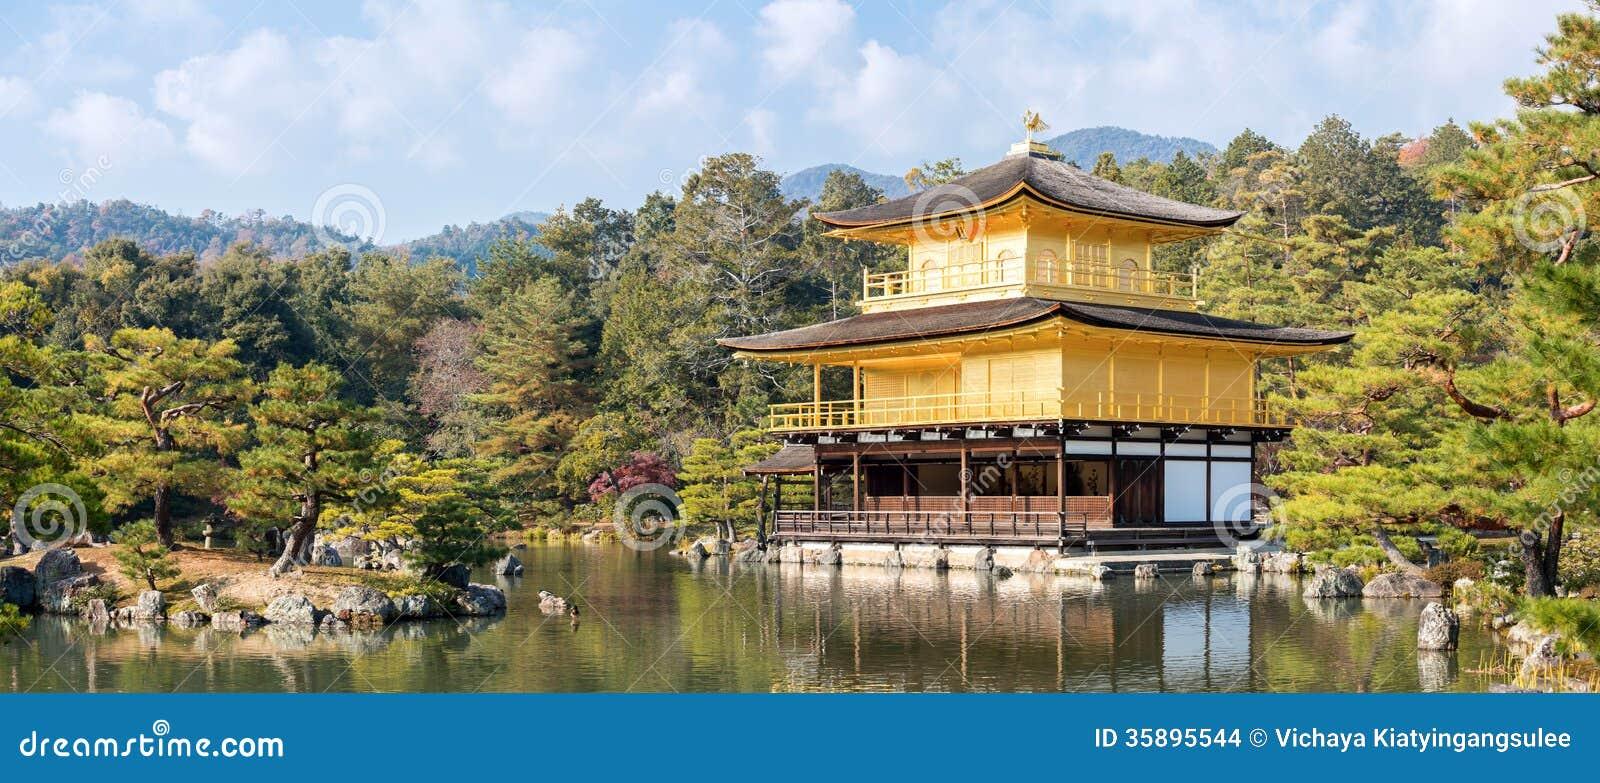 Gouden tempelpanorama